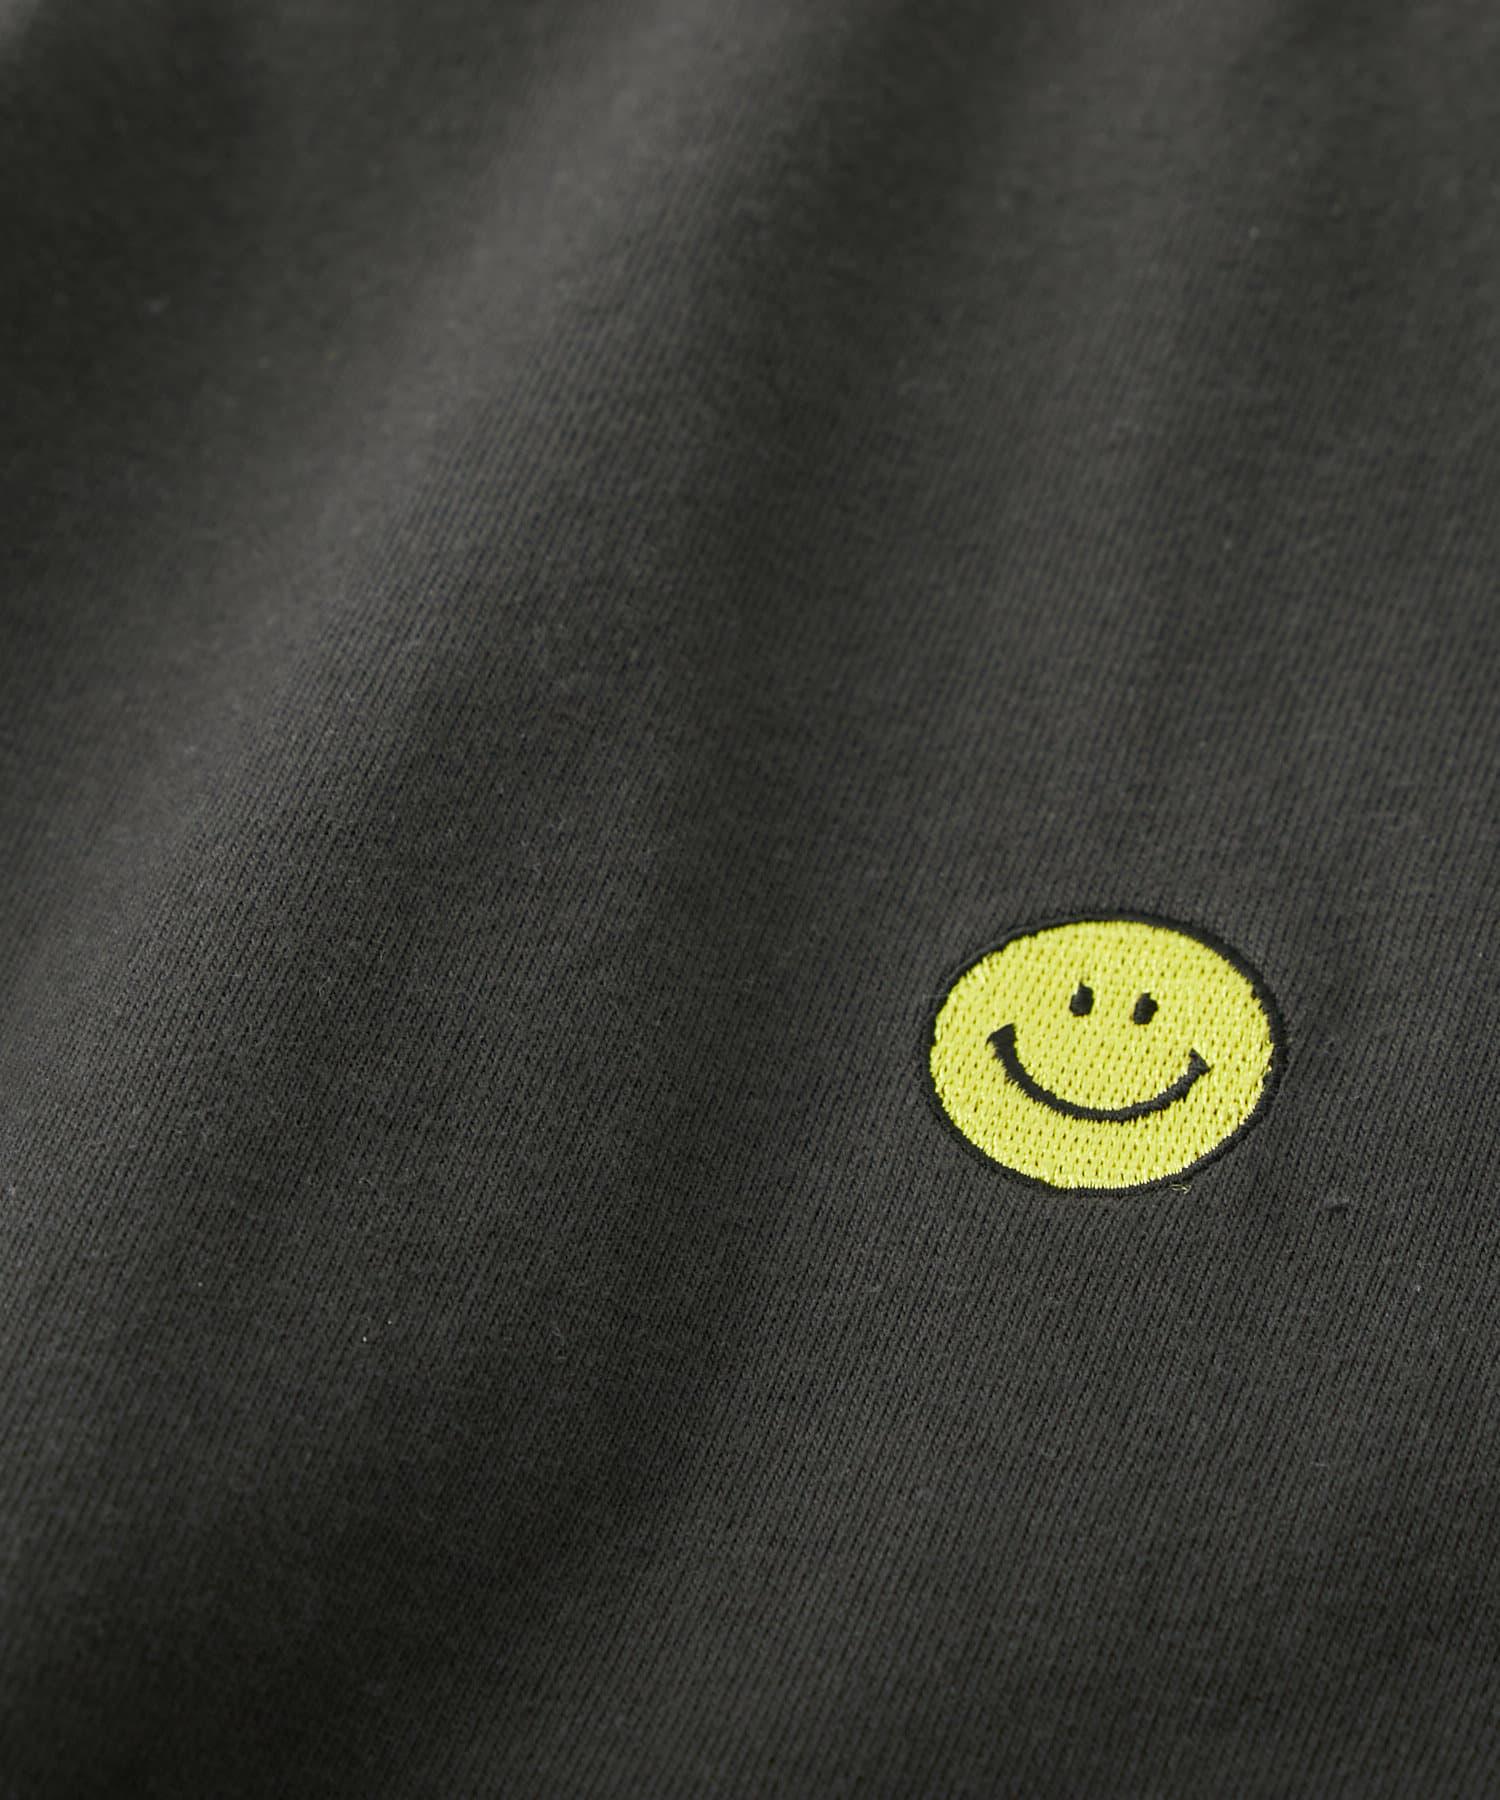 RIVE DROITE(リヴドロワ) 【GOOD ROCK SPEED】SmilyfaceジェンダーレスTシャツ